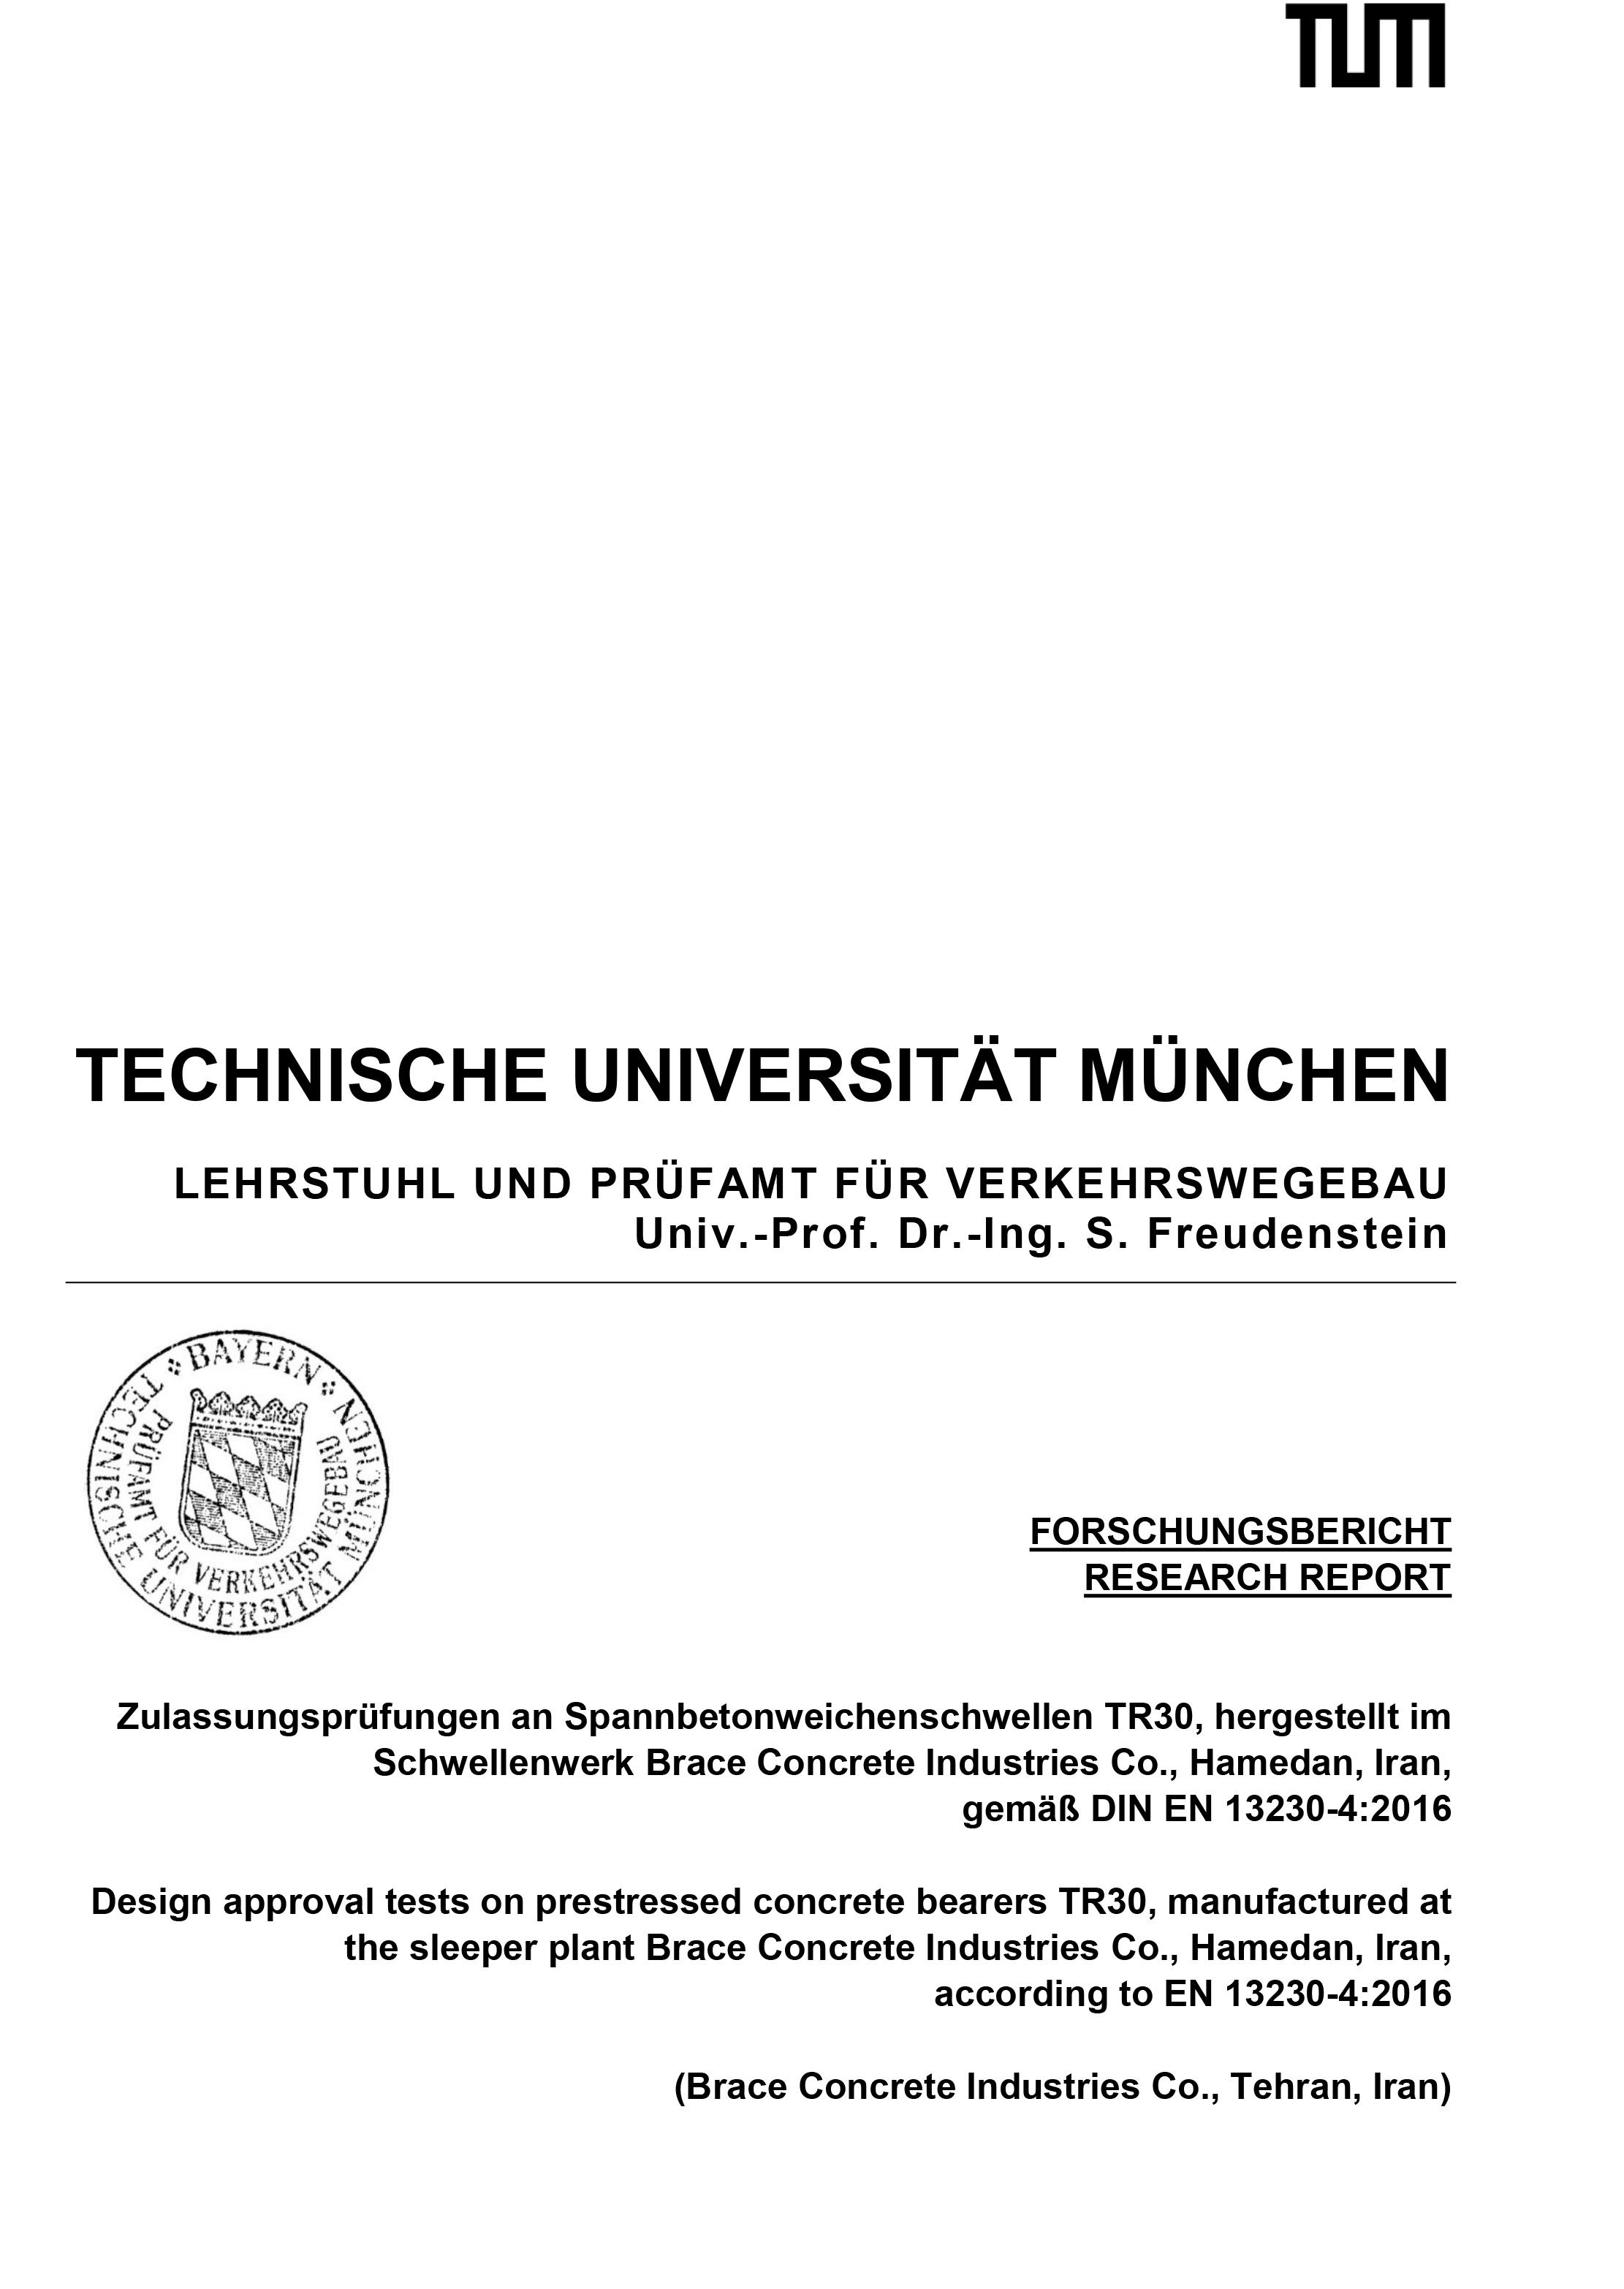 Certificate Of University of Munich – TR30